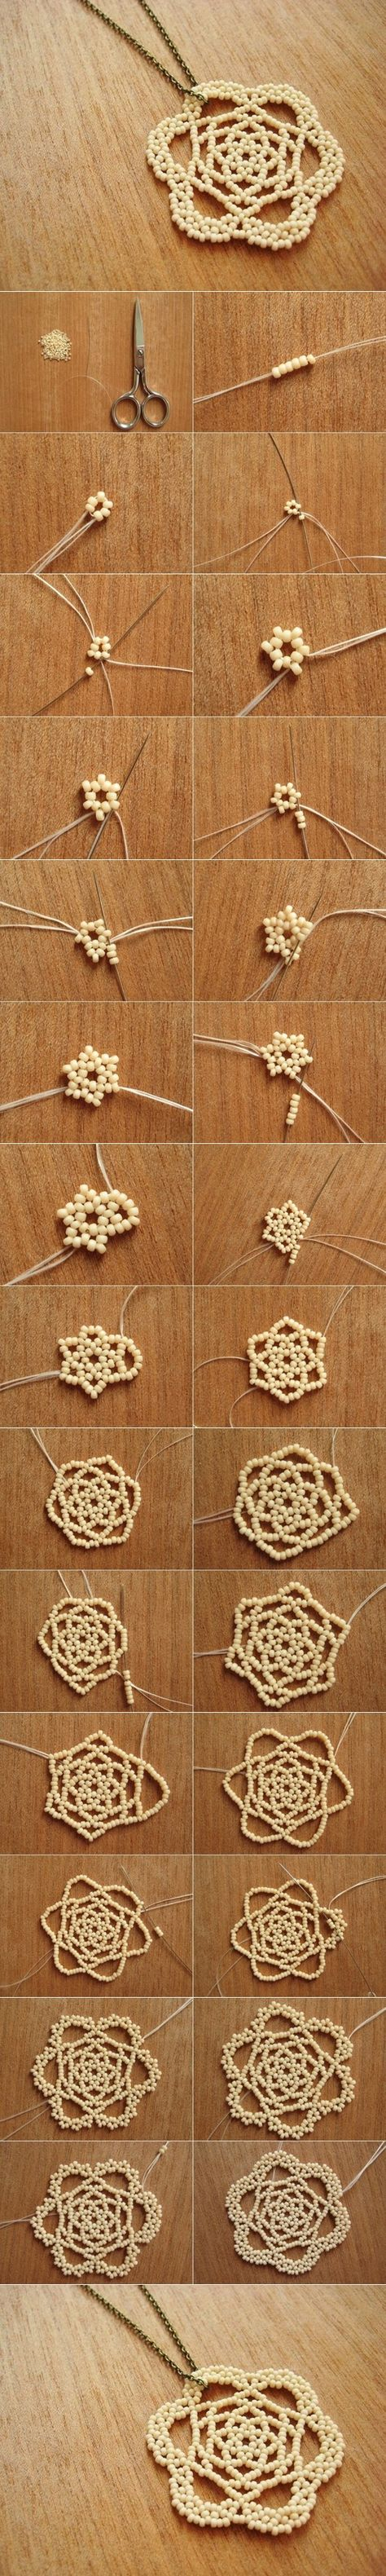 DIY Beaded Rose Necklace Pendant - http://manmadediy.me/diy-beaded-rose-necklace-pendant/